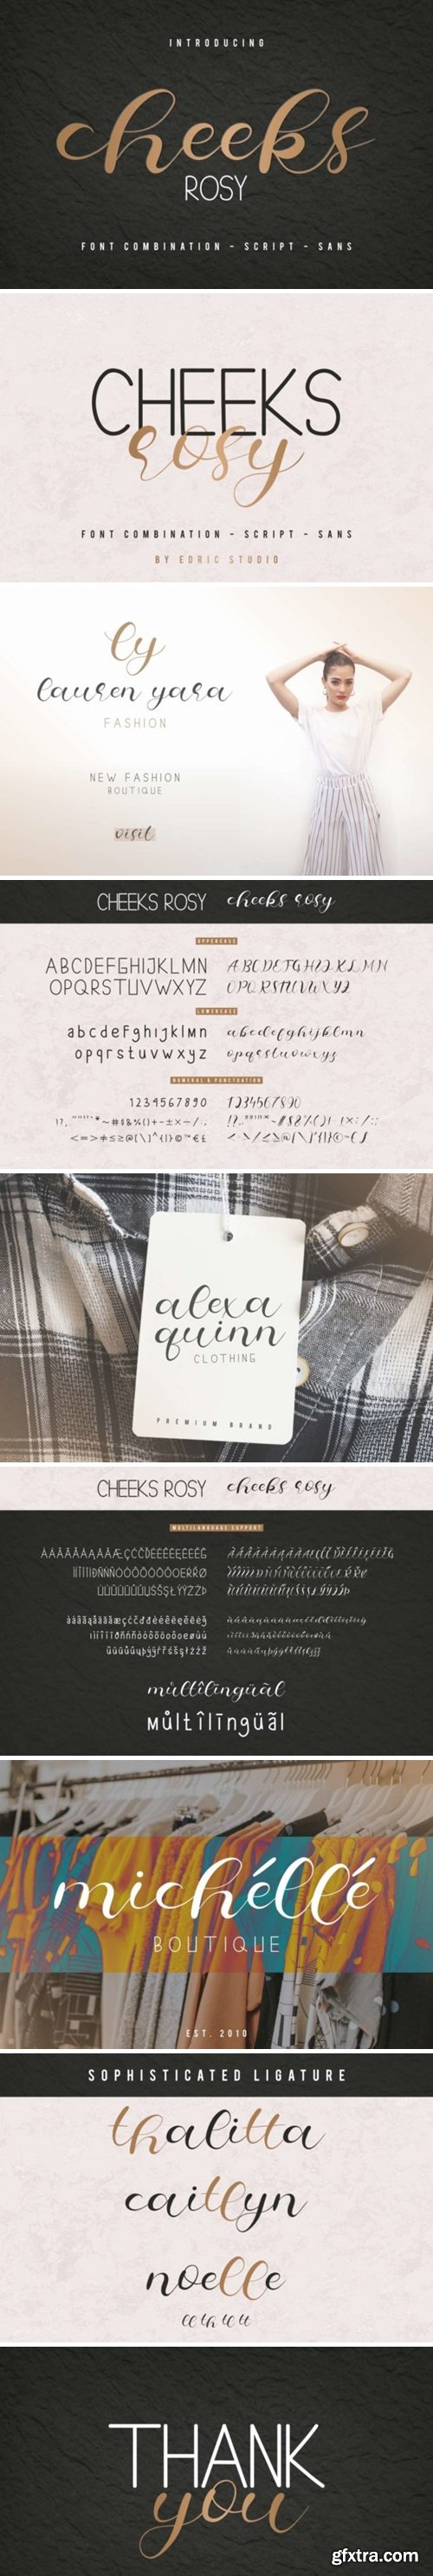 Fontbundles - Cheeks Rosy Font 519201